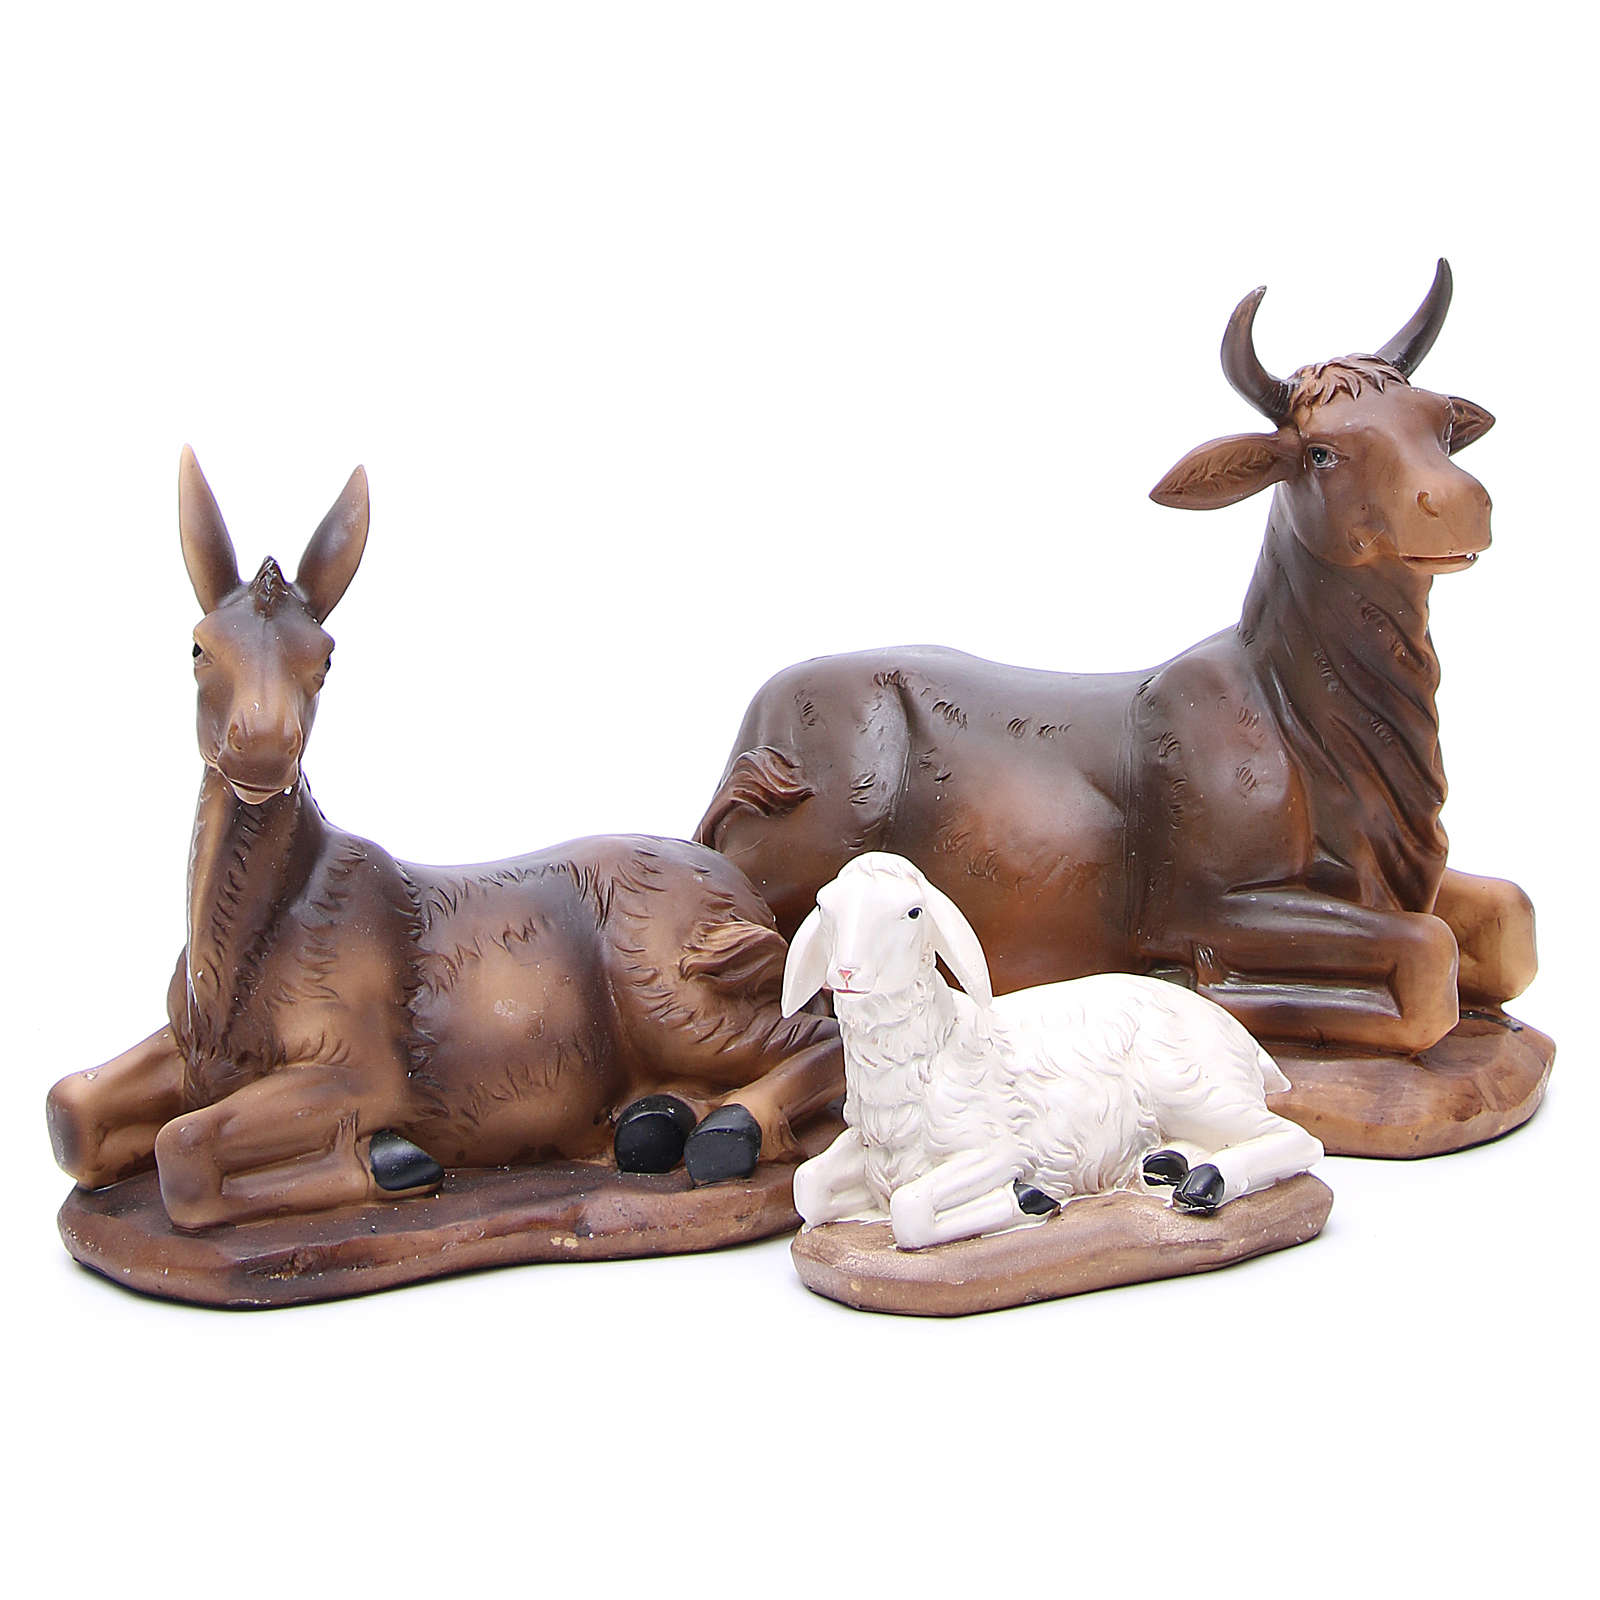 Nativity set in resin, 11 figurines 43cm wood-like finish 4